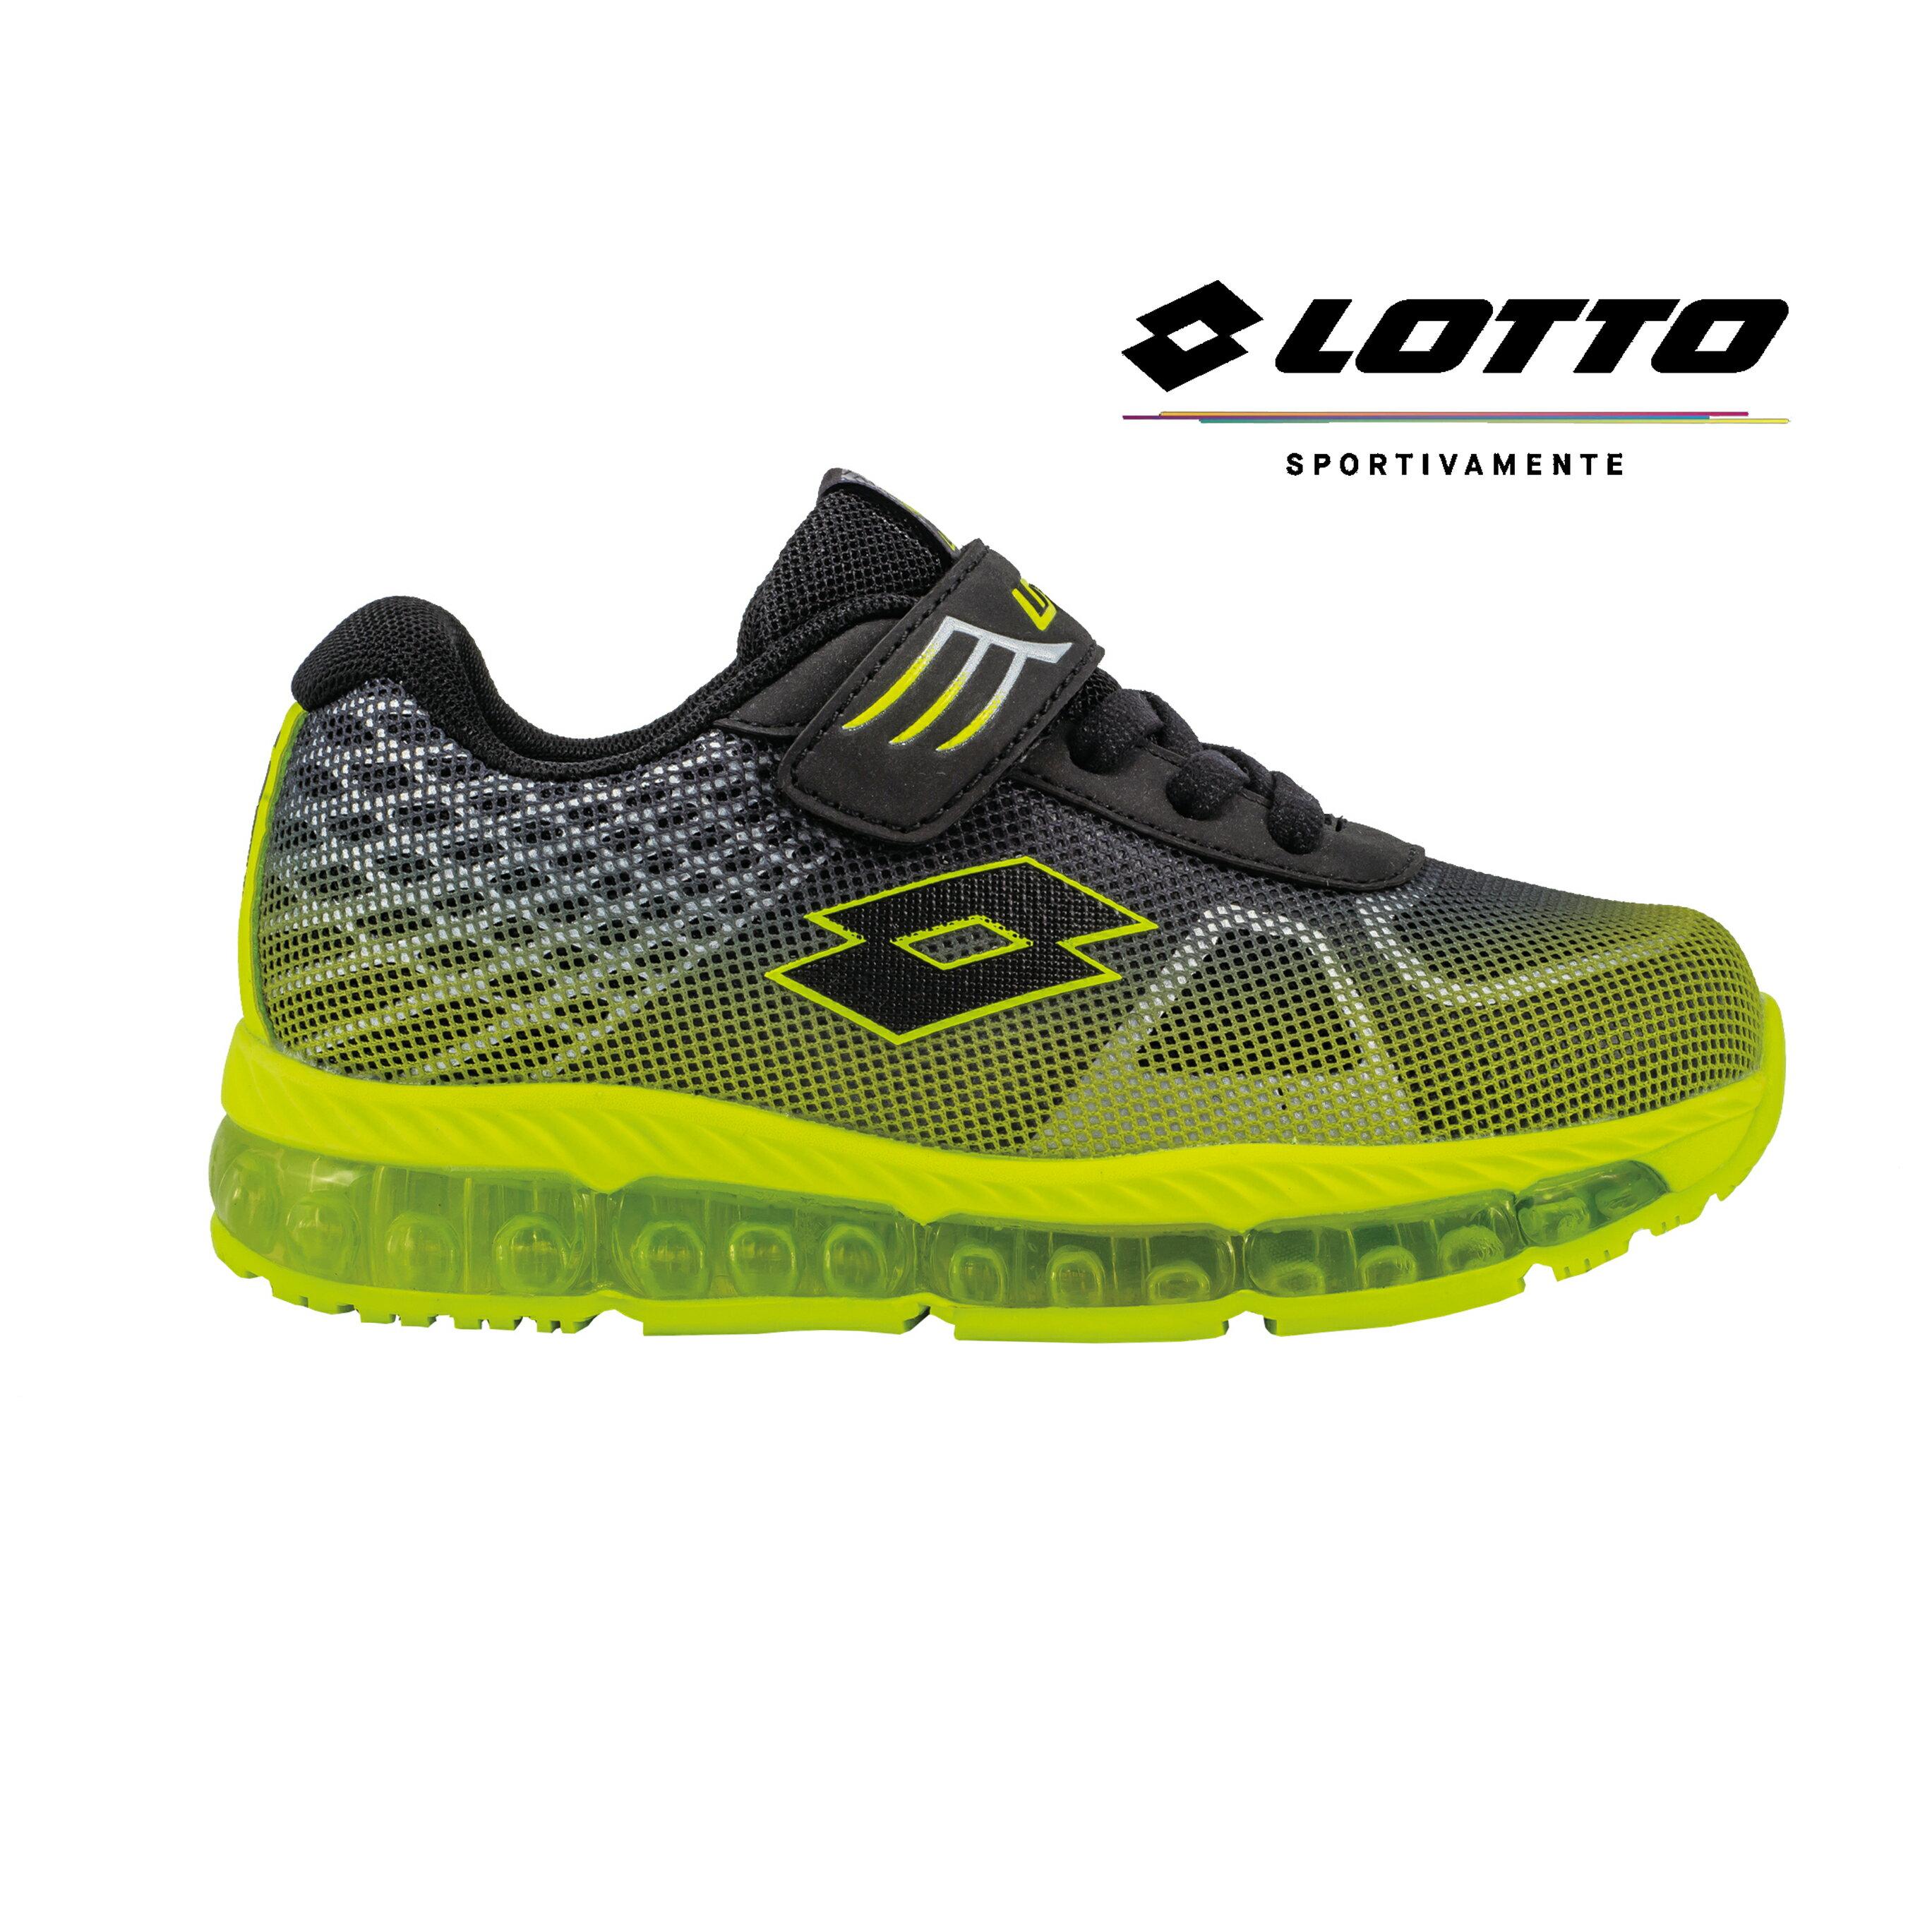 LOTTO樂得-義大利第一品牌 童款無車縫GUMMY全氣墊彈力跑鞋 [3755] 黑綠【巷子屋】